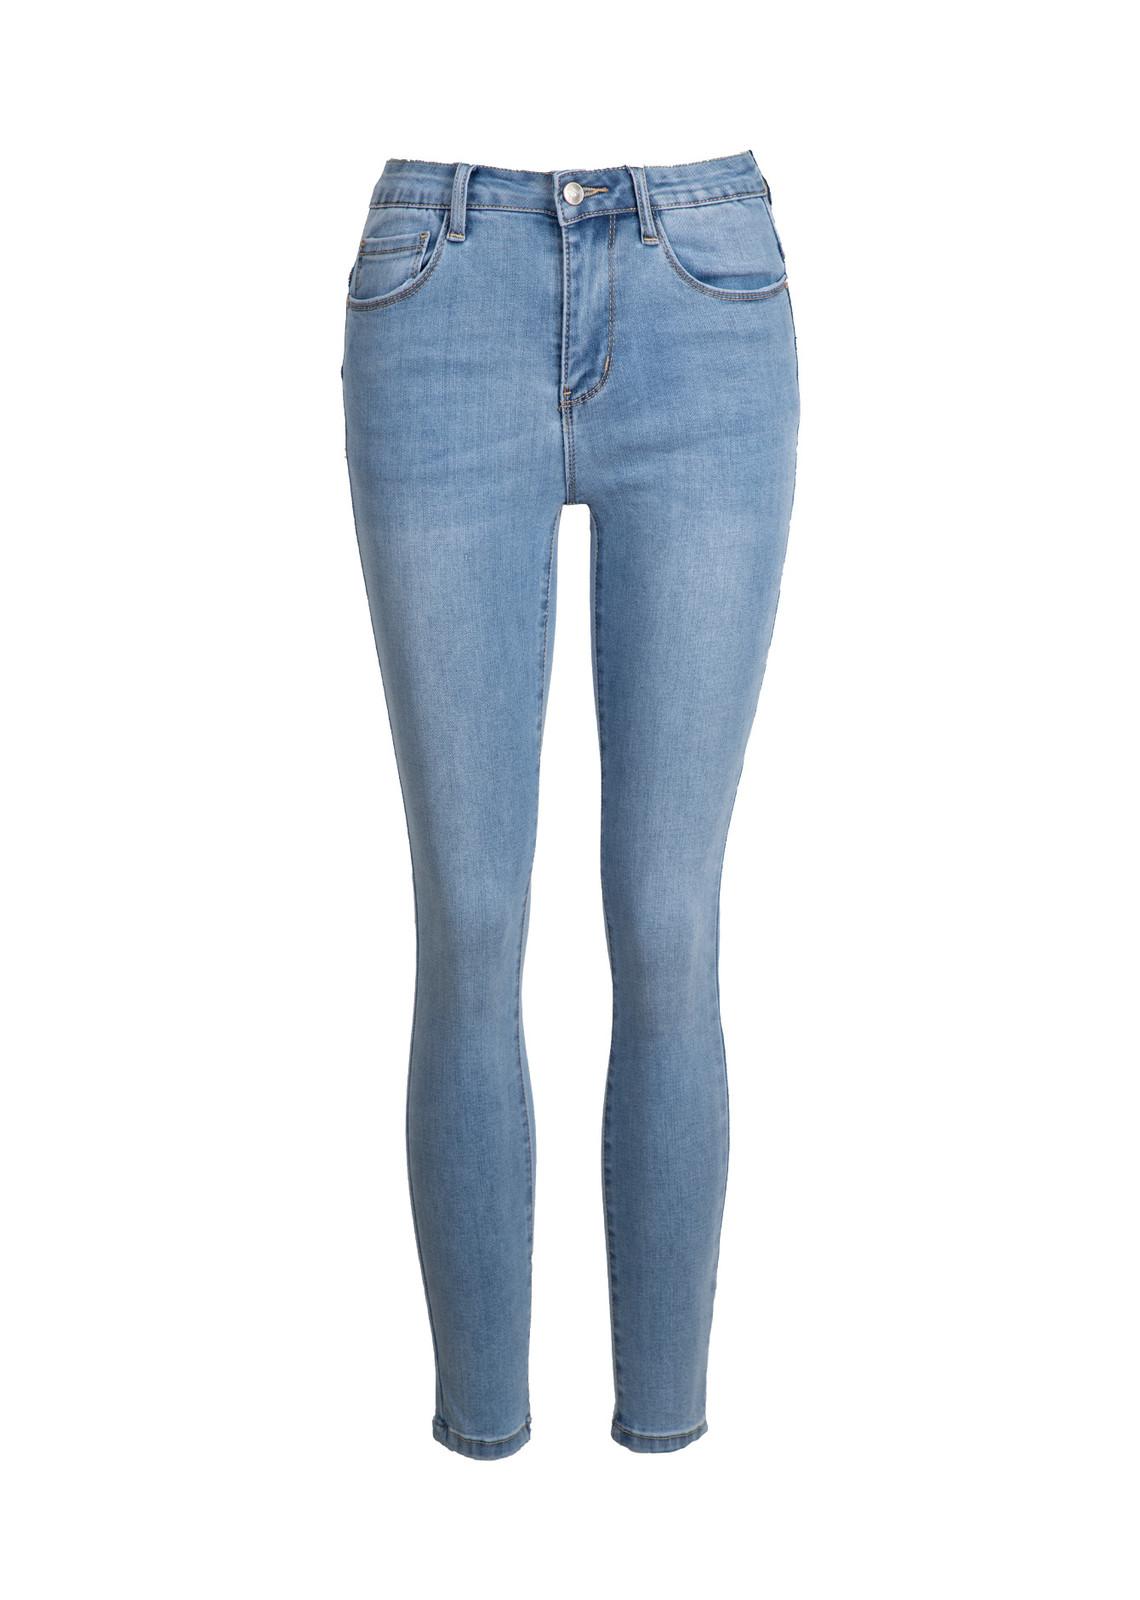 Denims jeans Joelle blauw